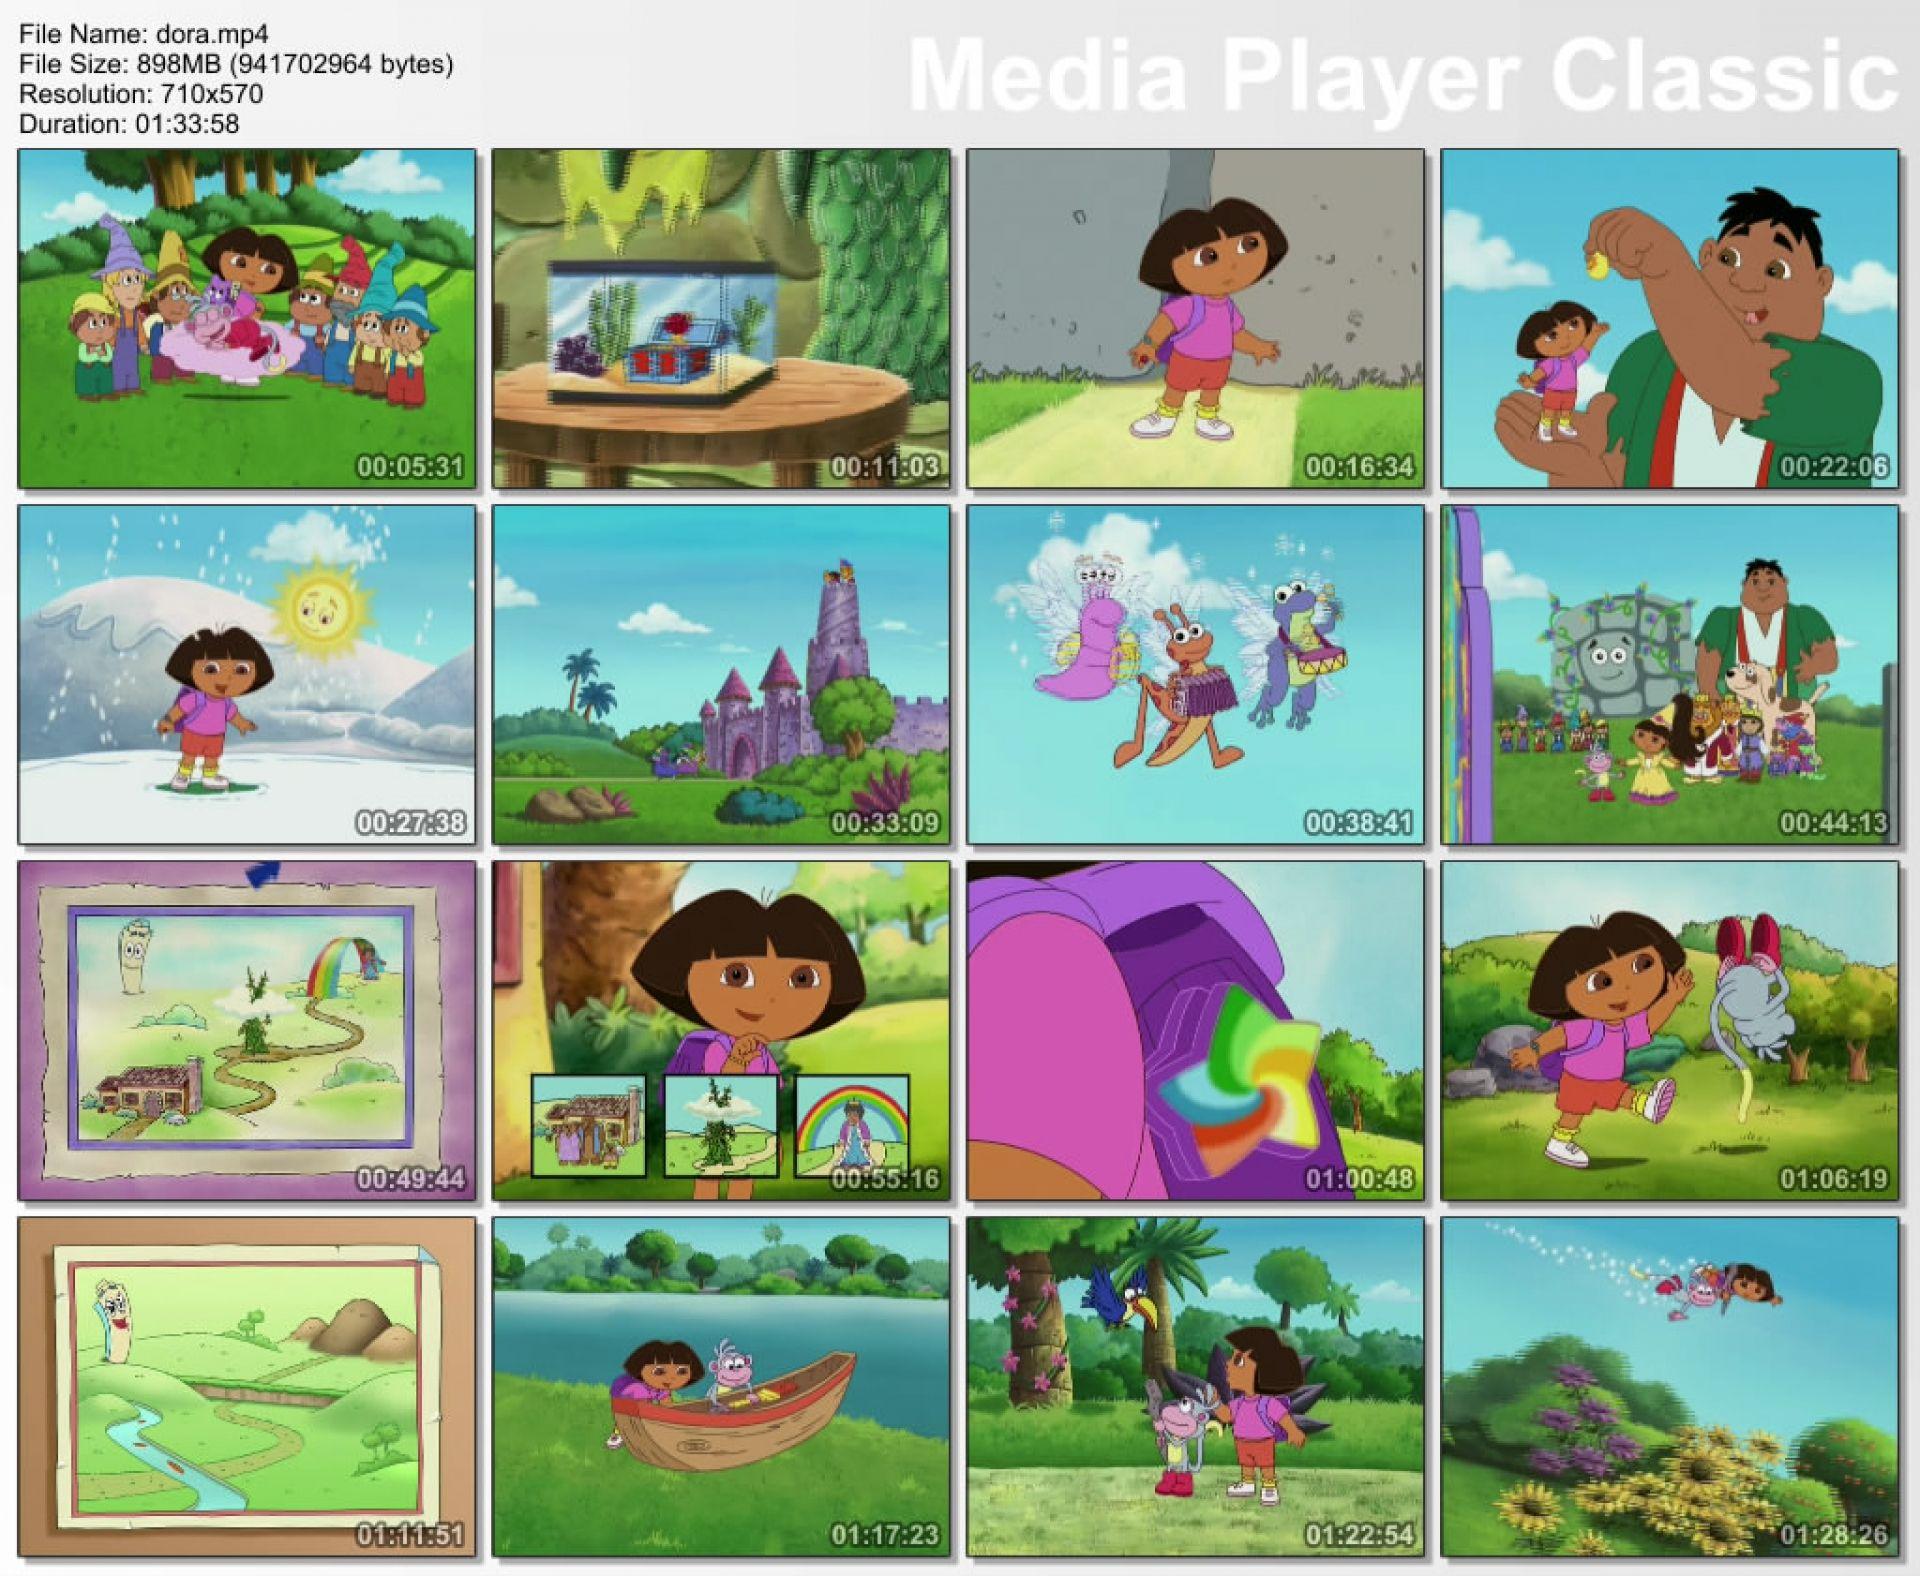 dora's fairytale adventure | Dora the explorer fairytale ...